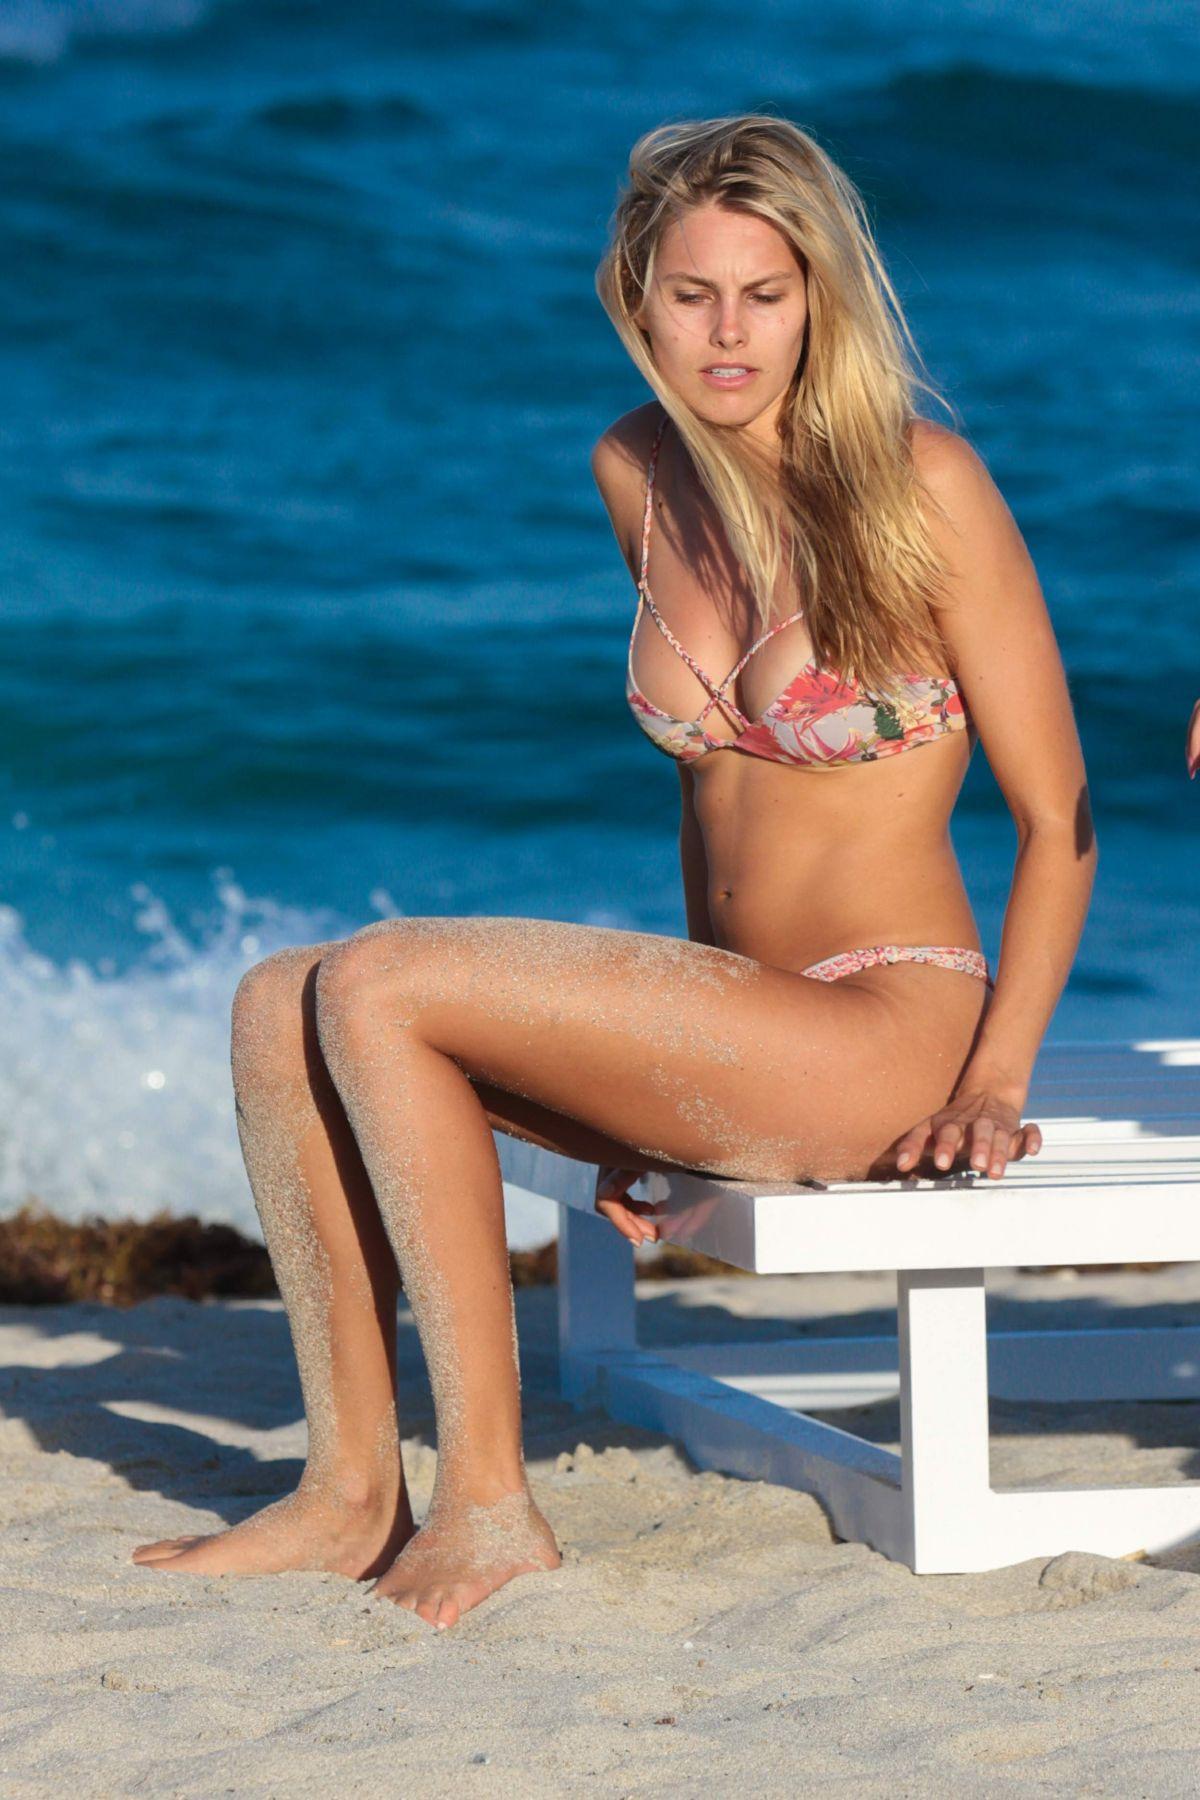 Amanda corey nude pictures